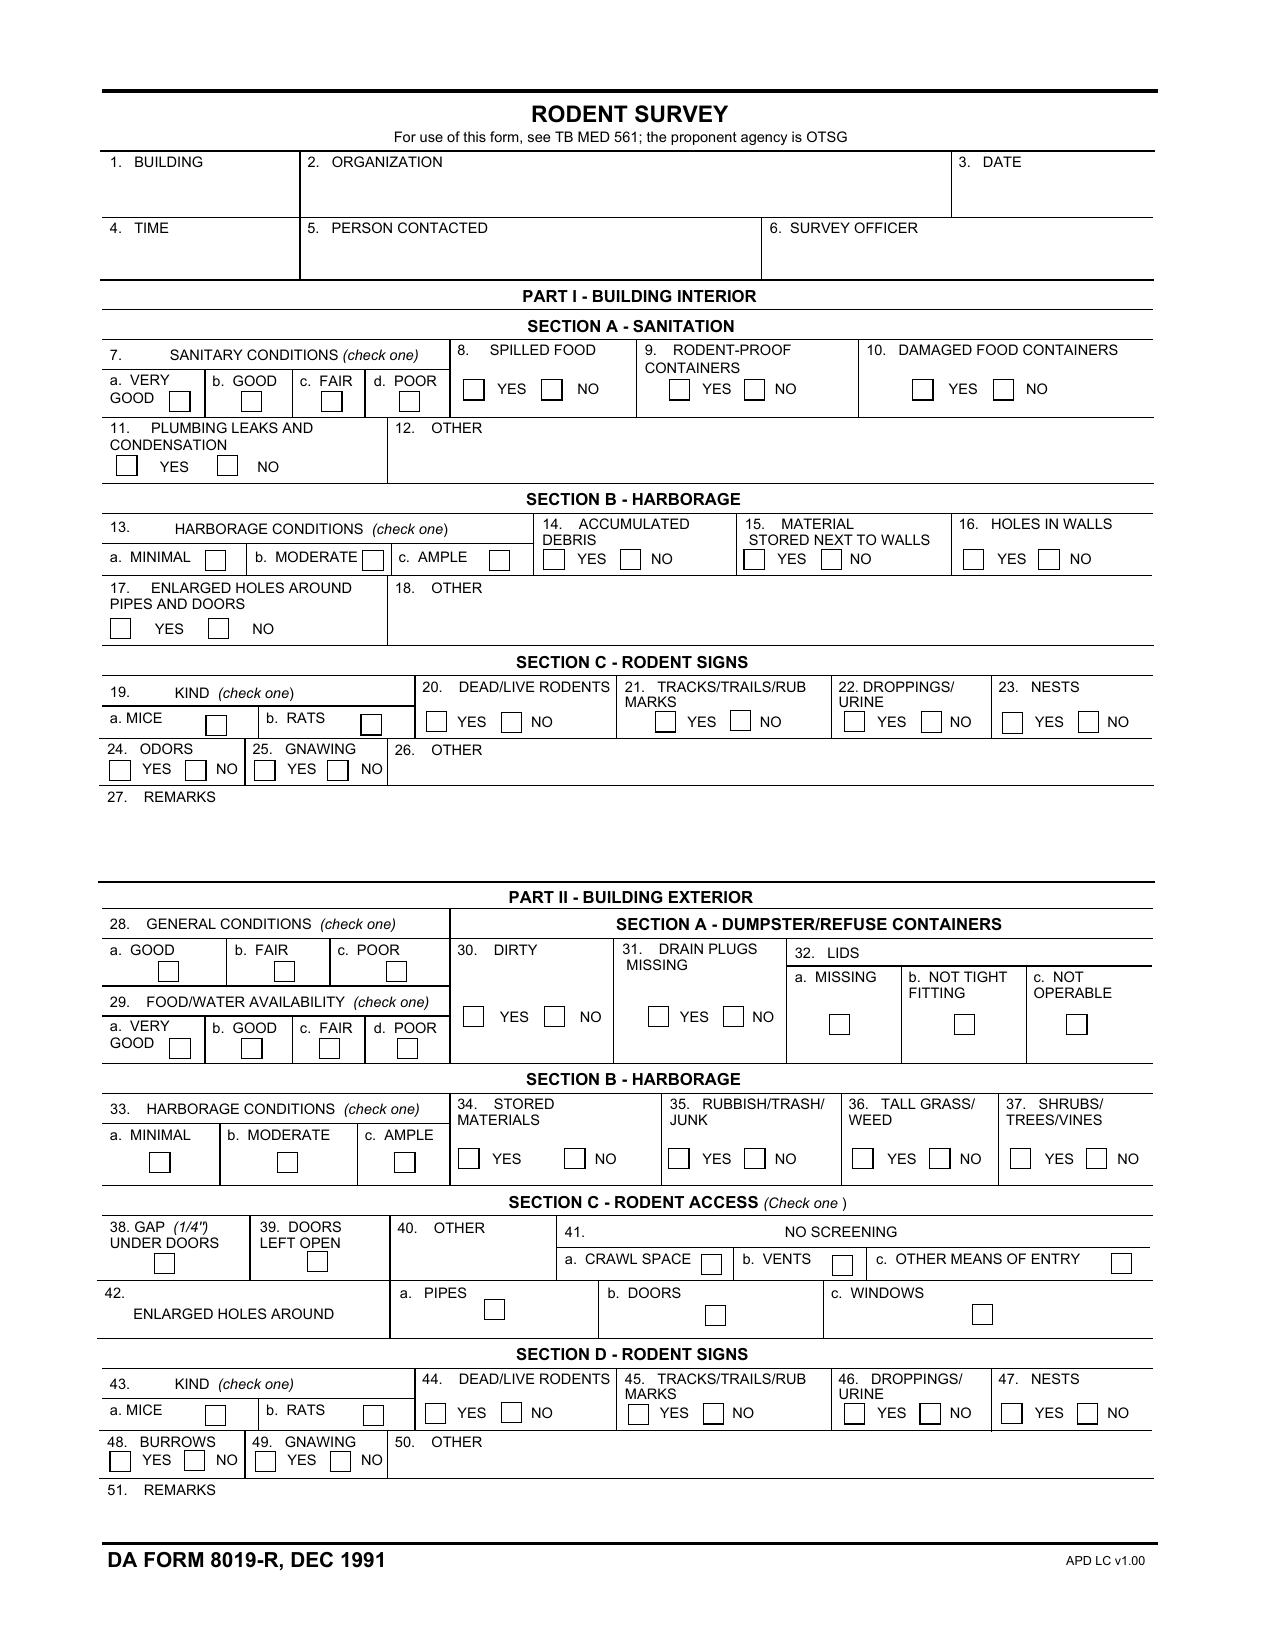 Download da Form 8019-R Free